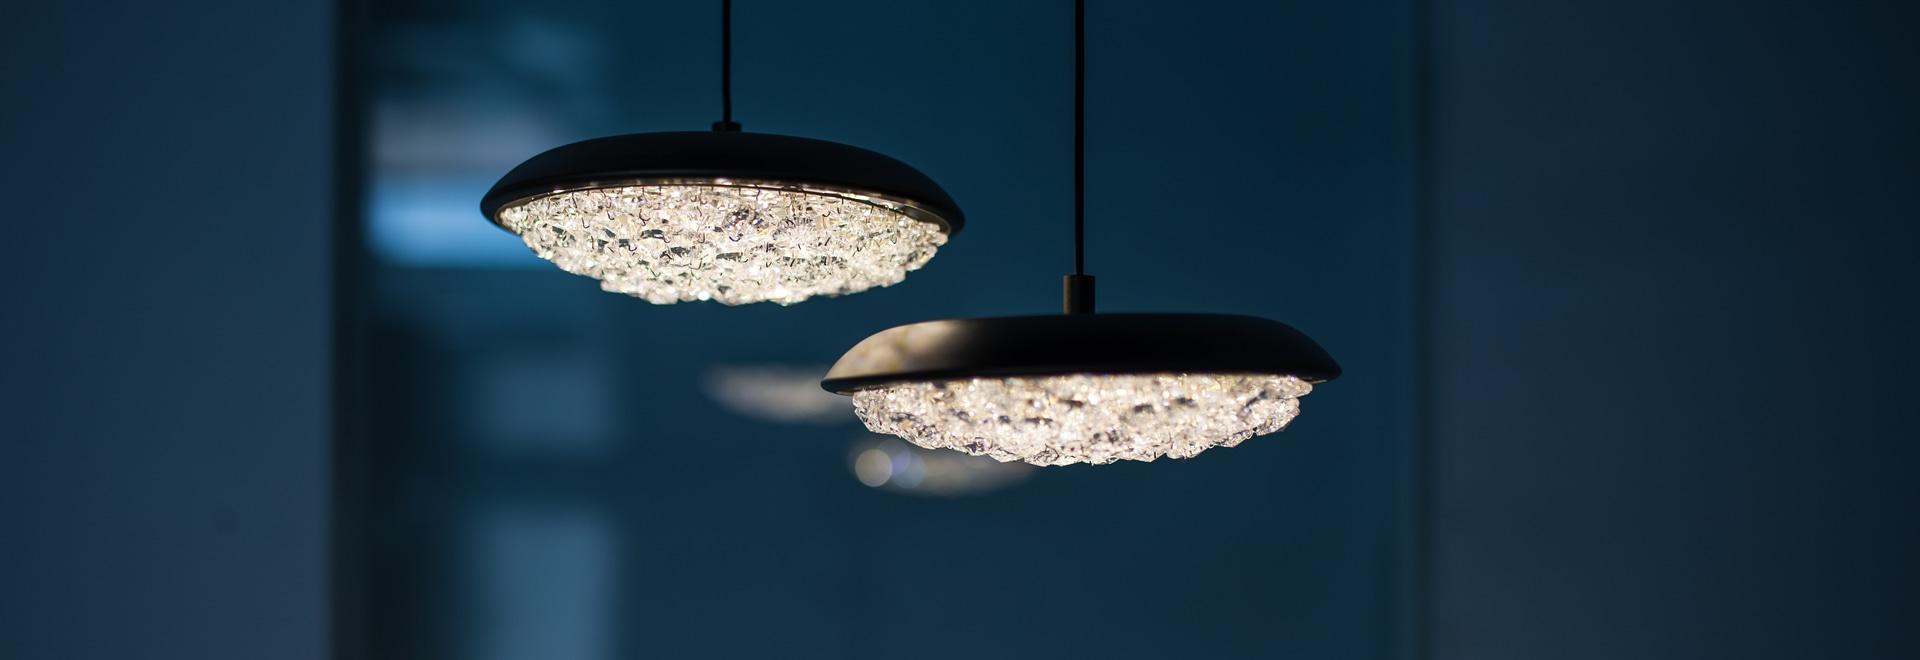 Origo crystal lights